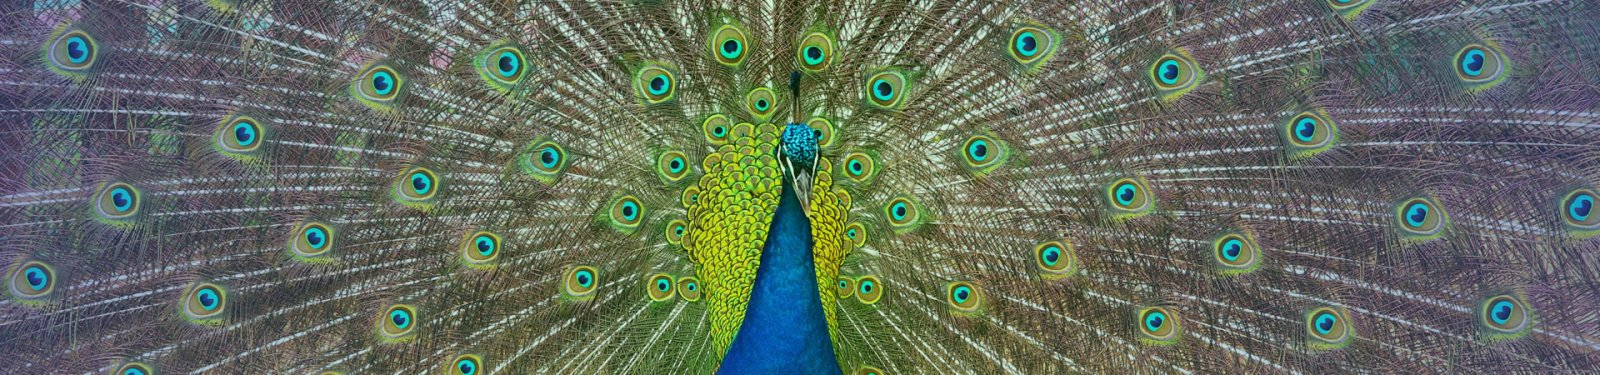 peacock-1600x375